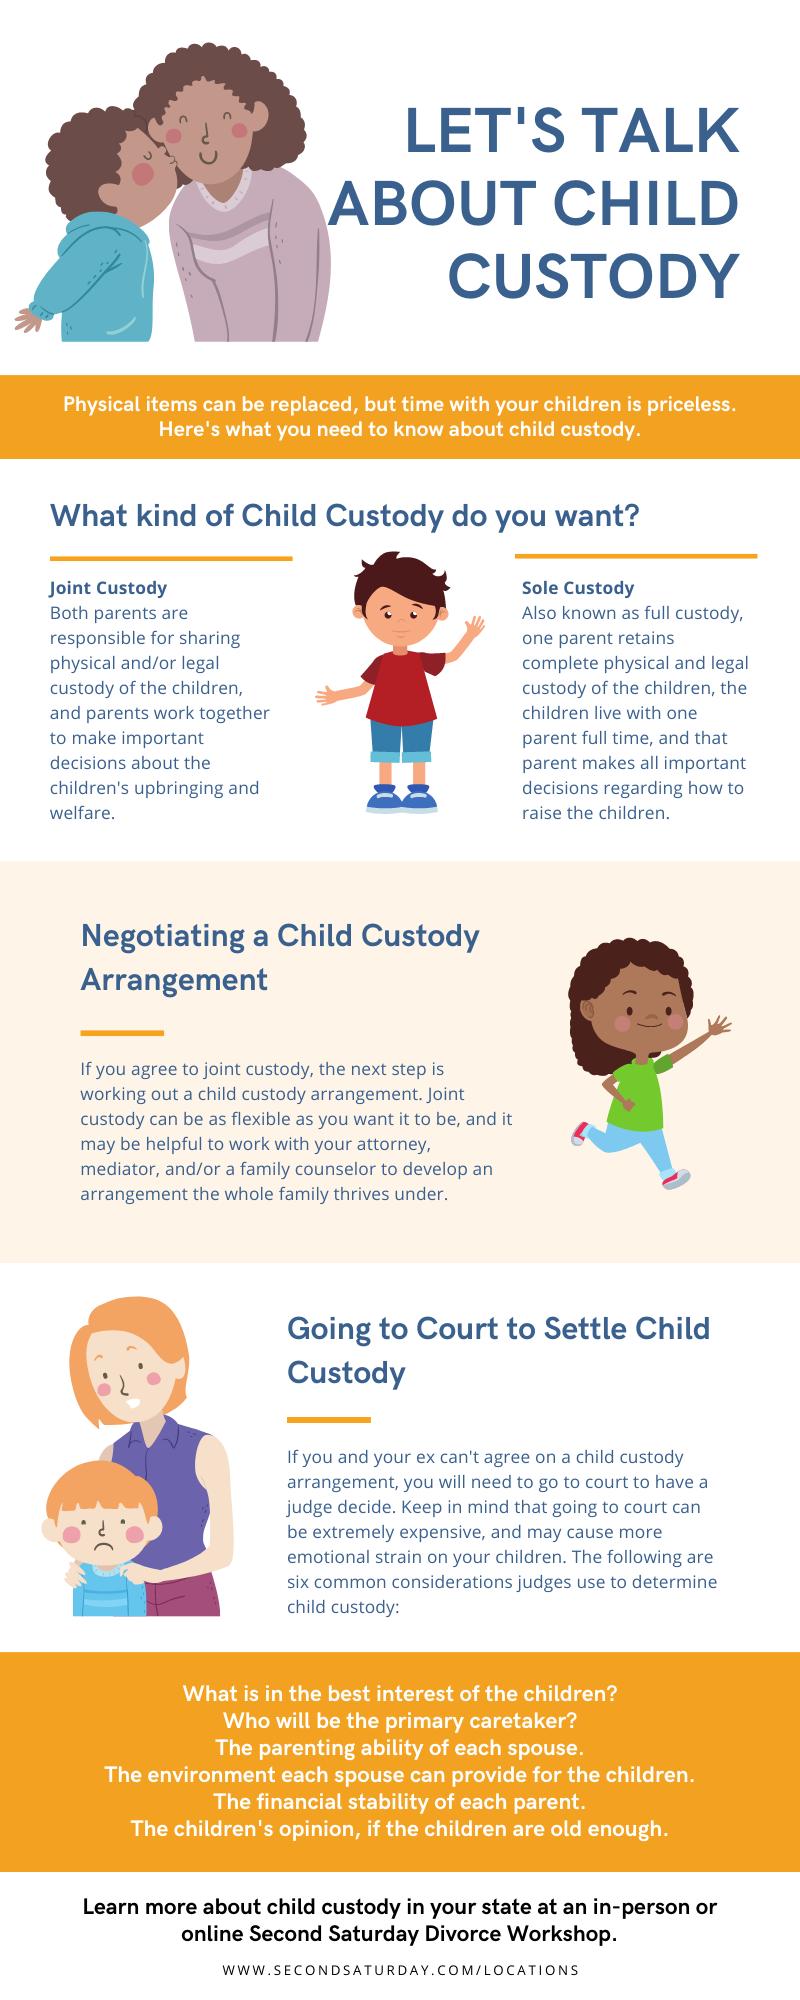 infographic summarizing blog post of information about child custody